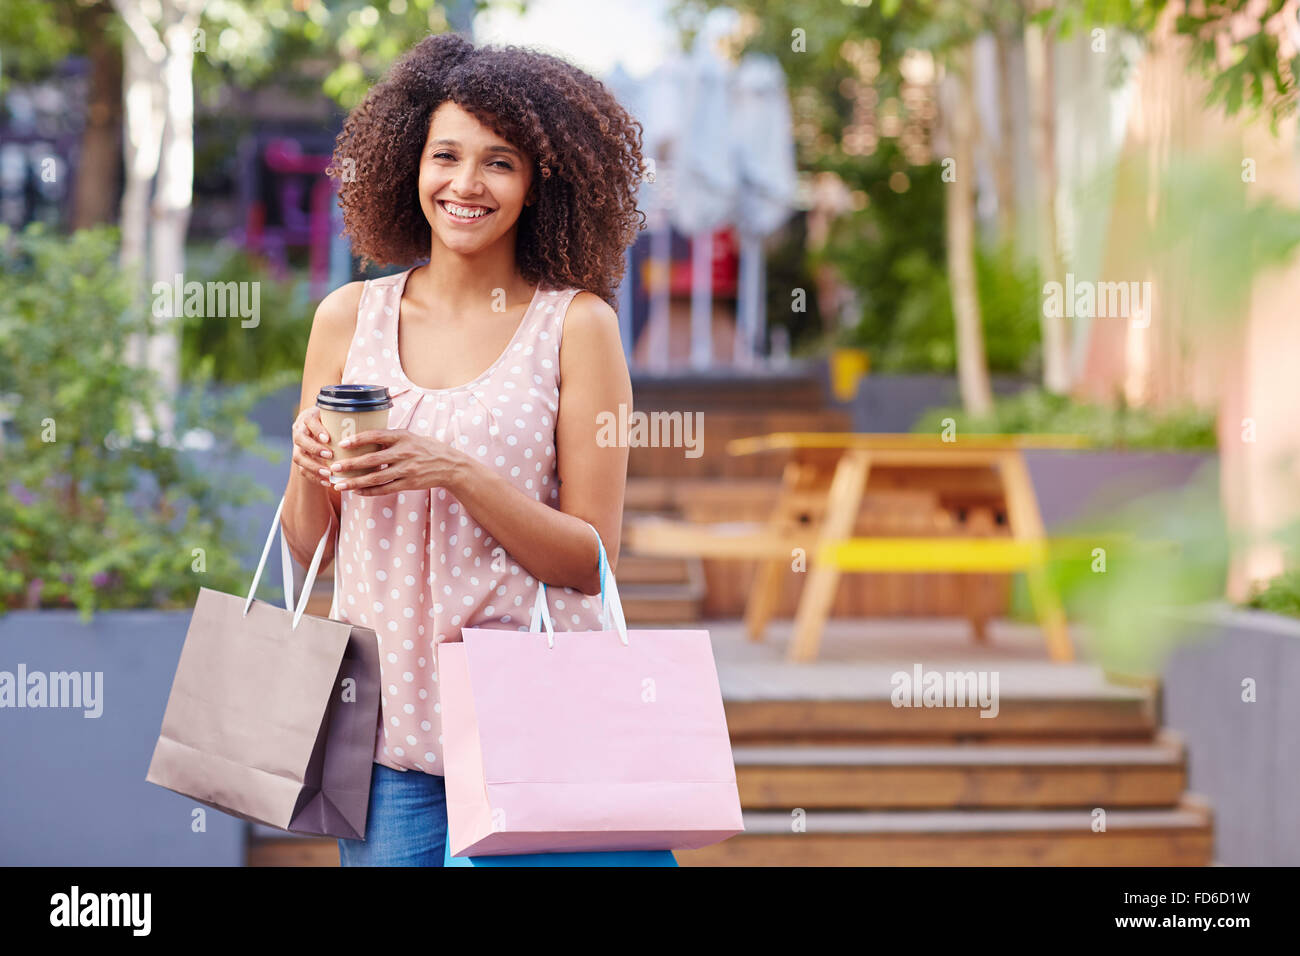 She's an avid shopper Stock Photo